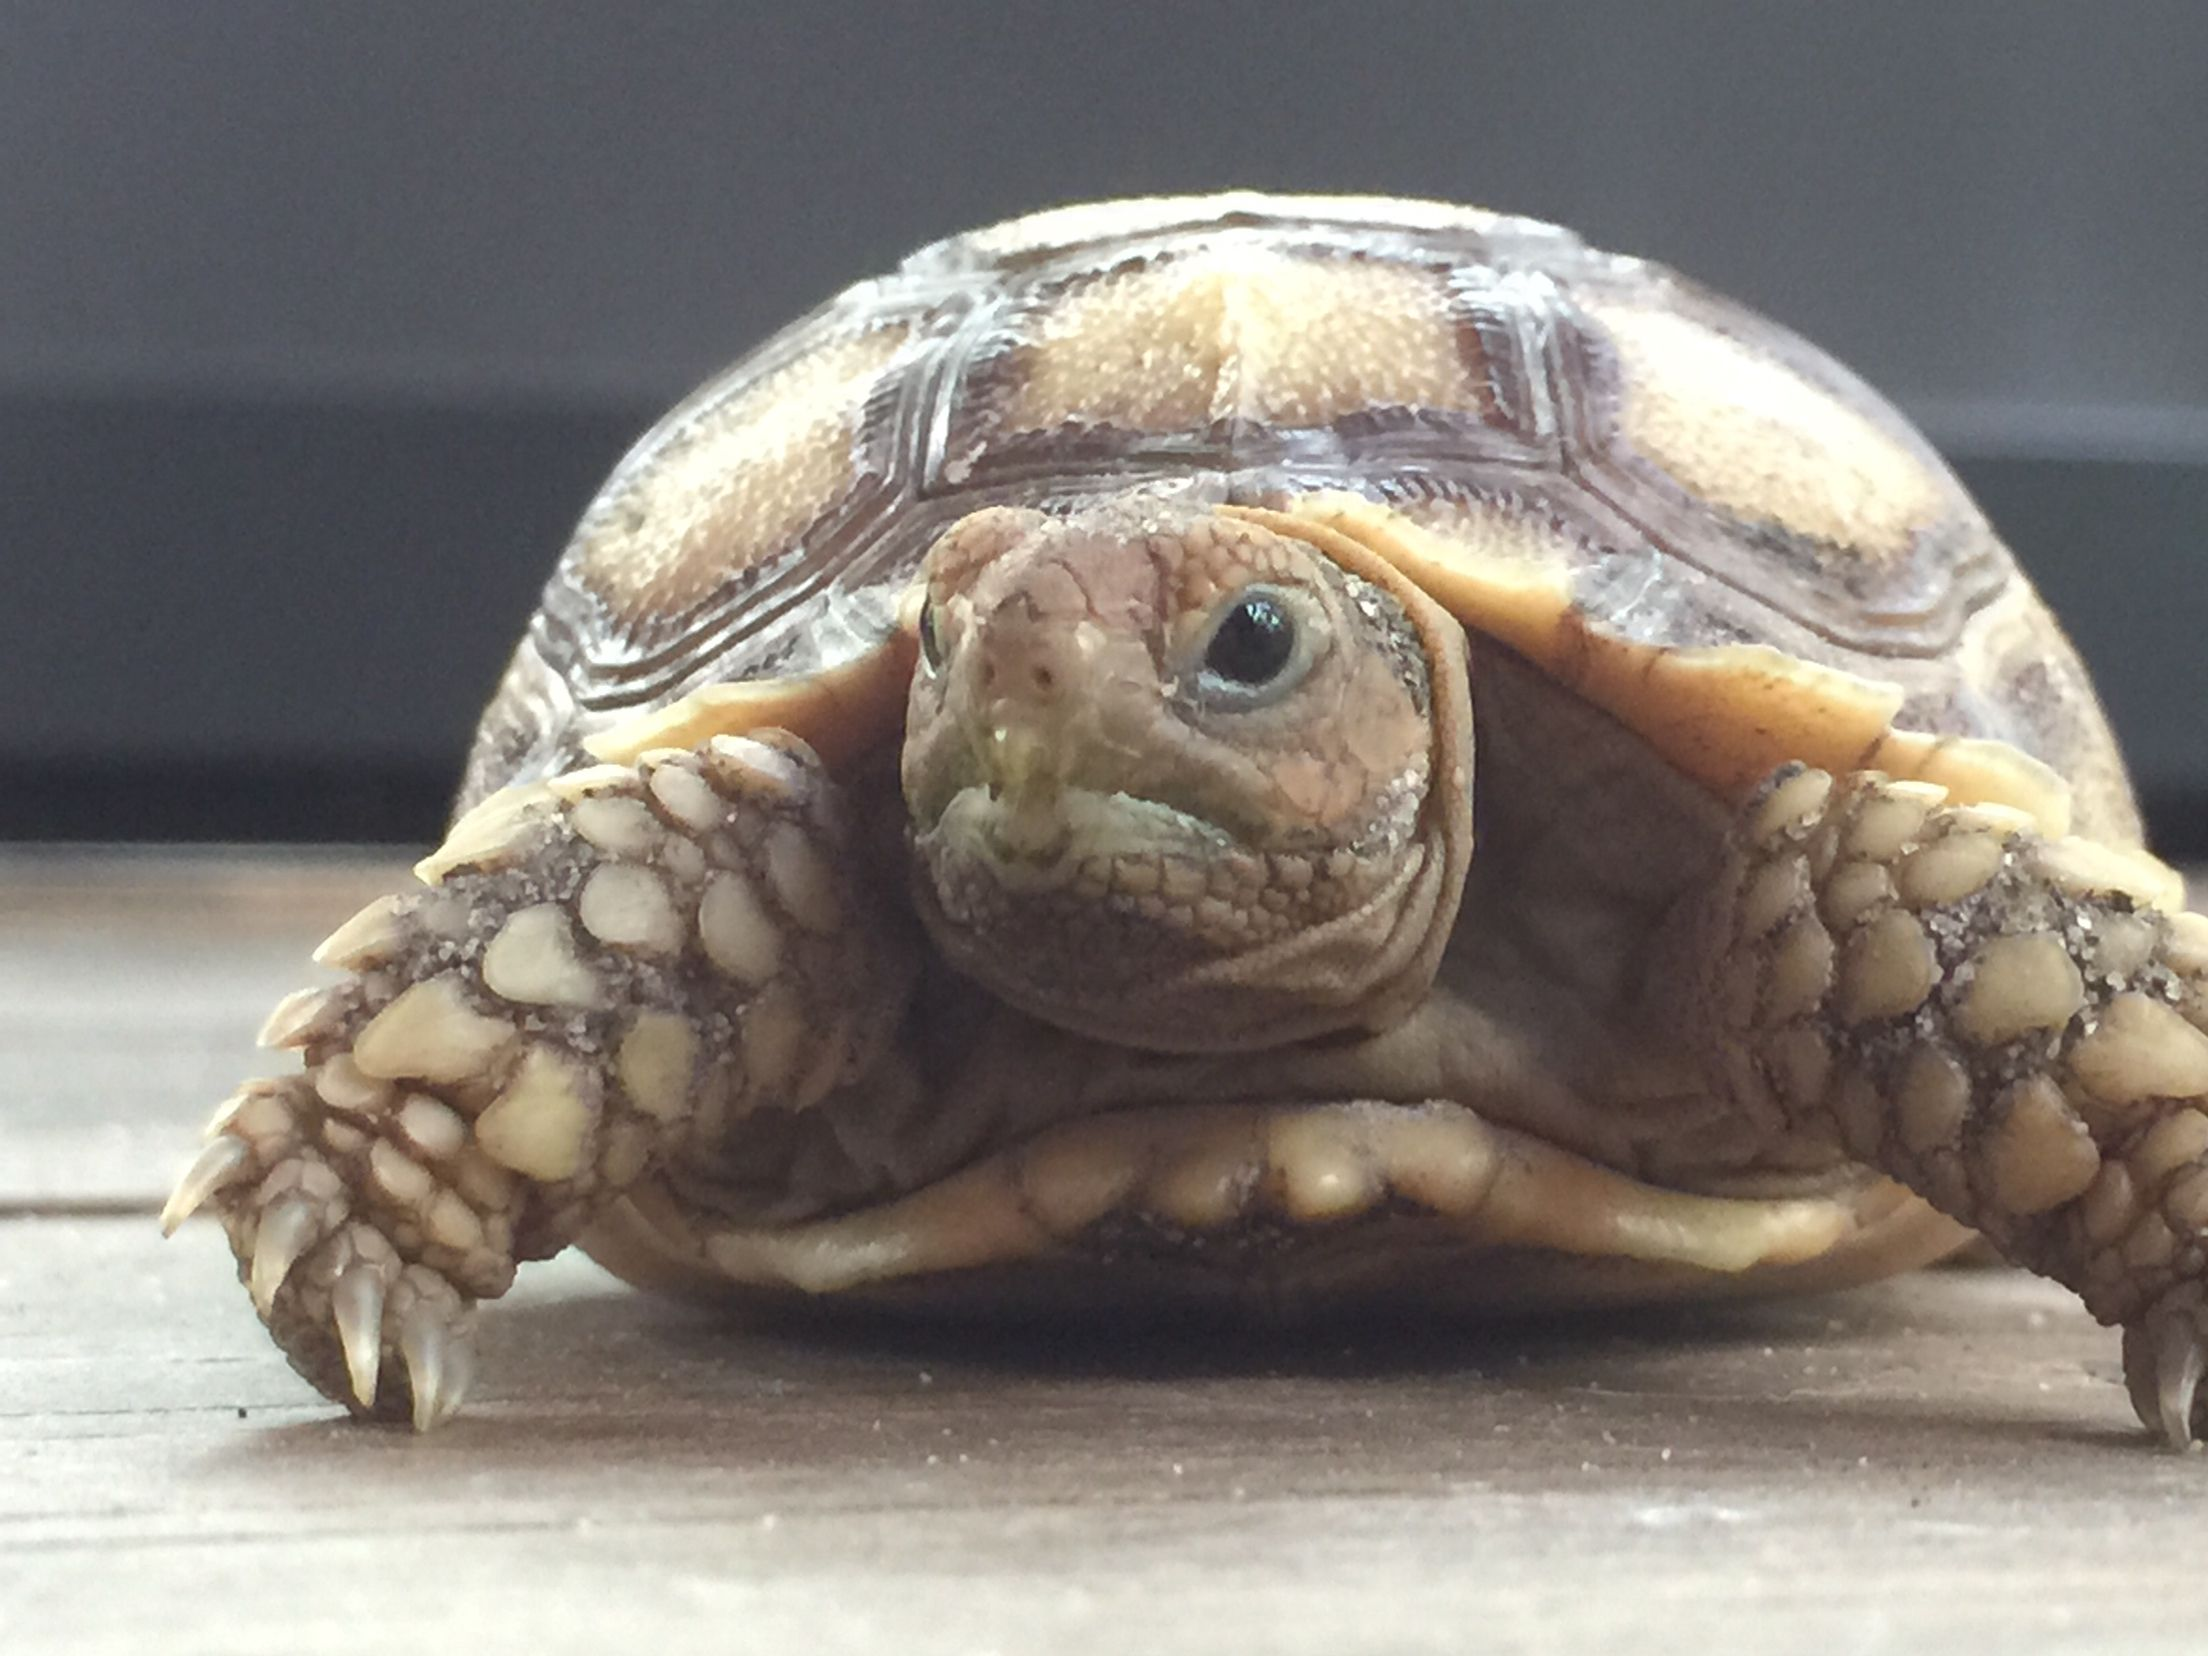 Baby sulcata tortoise turtlesfrogs pinterest sulcata tortoise